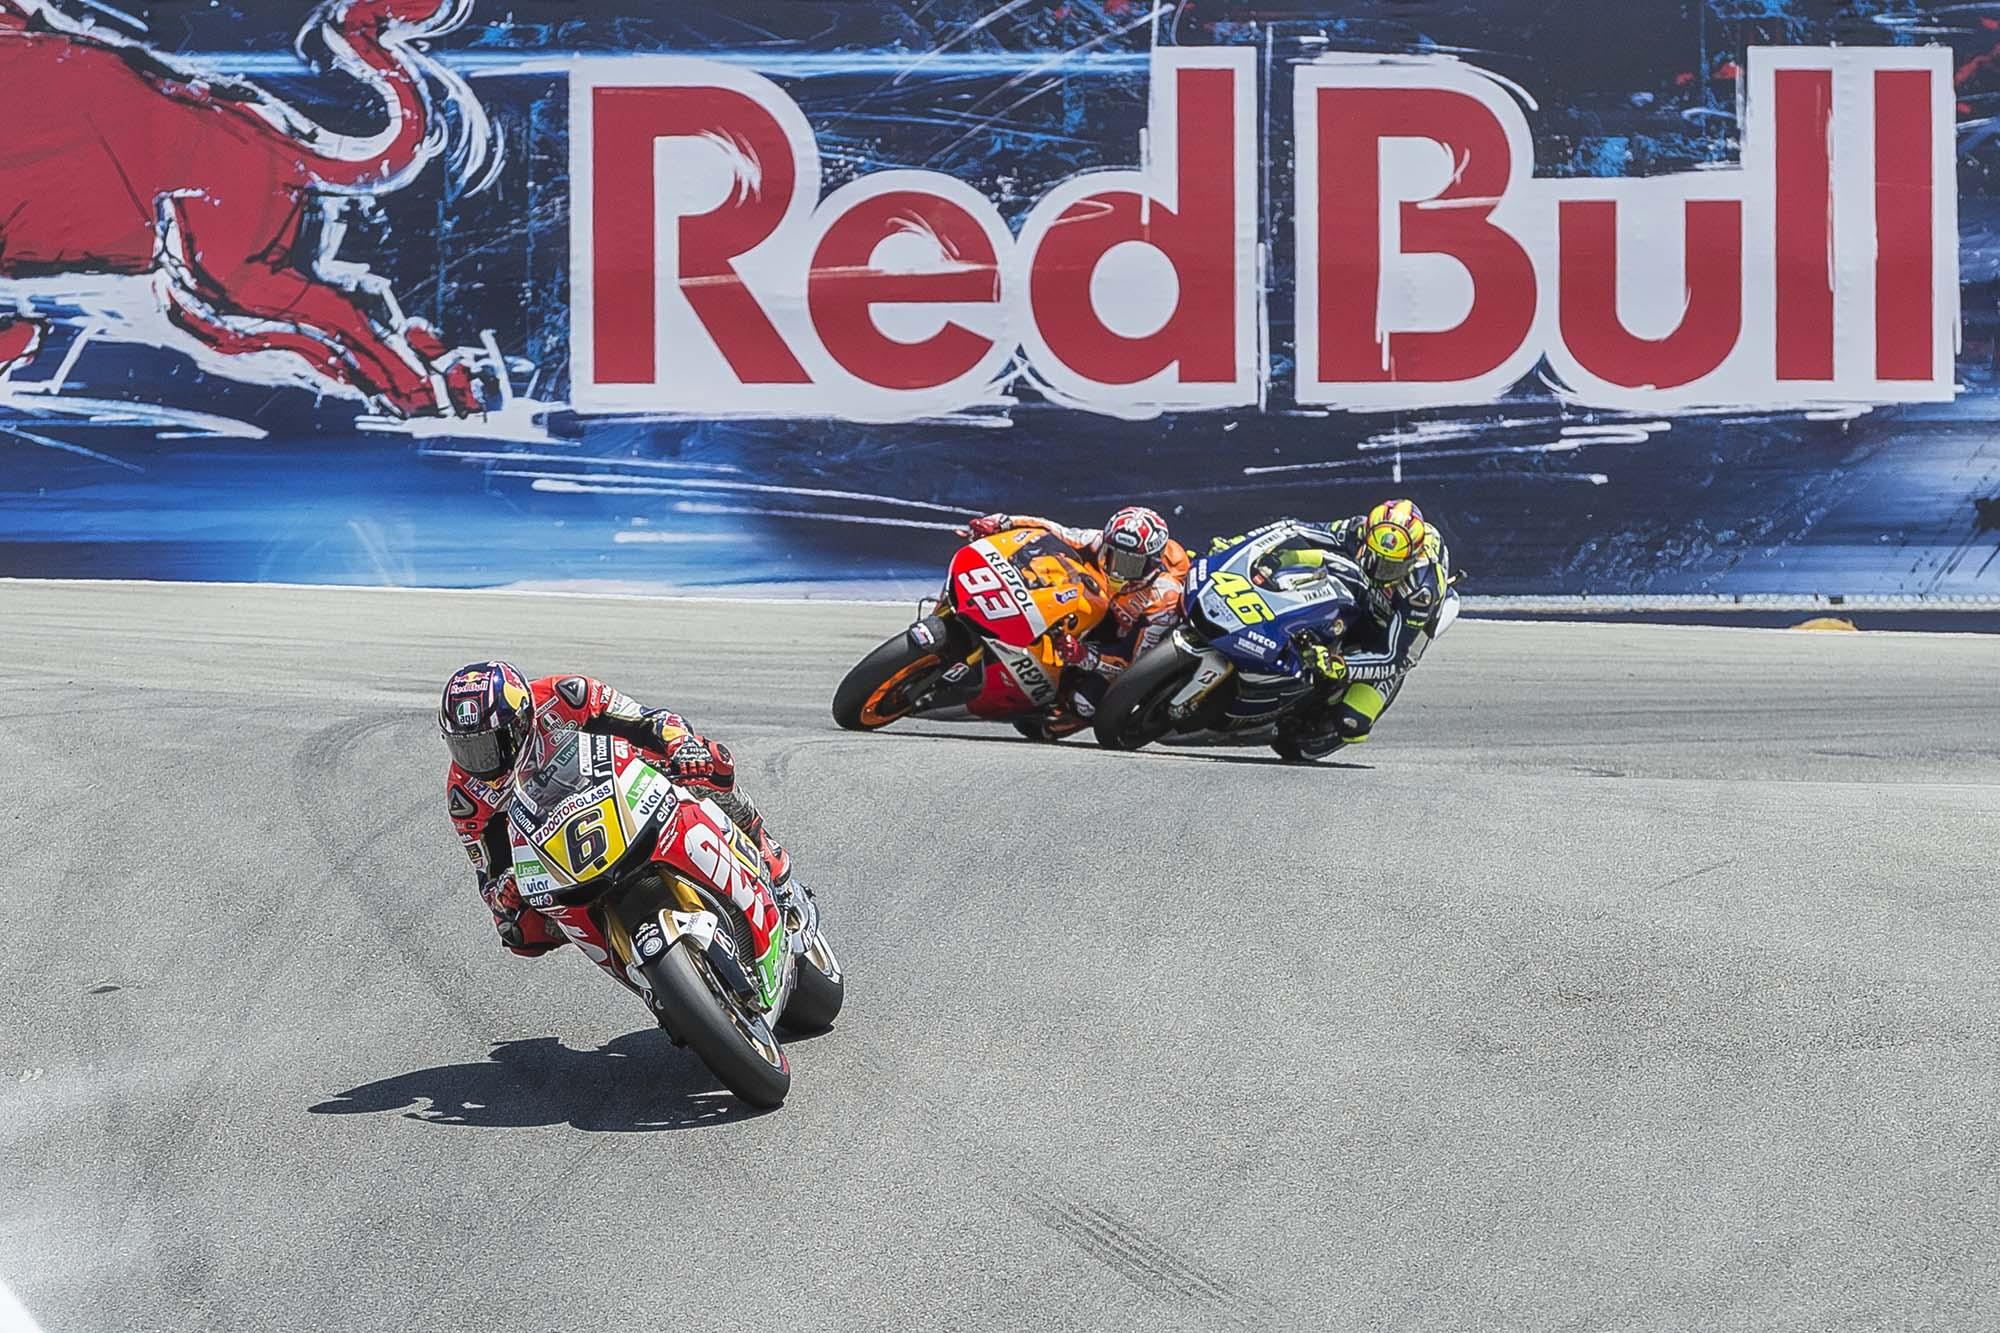 GP Laguna Seca - Page 3 Marc-Marquez-Valentino-Rossi-Laguna-Seca-Corkscrew-Pass-Kevin-Warren-1